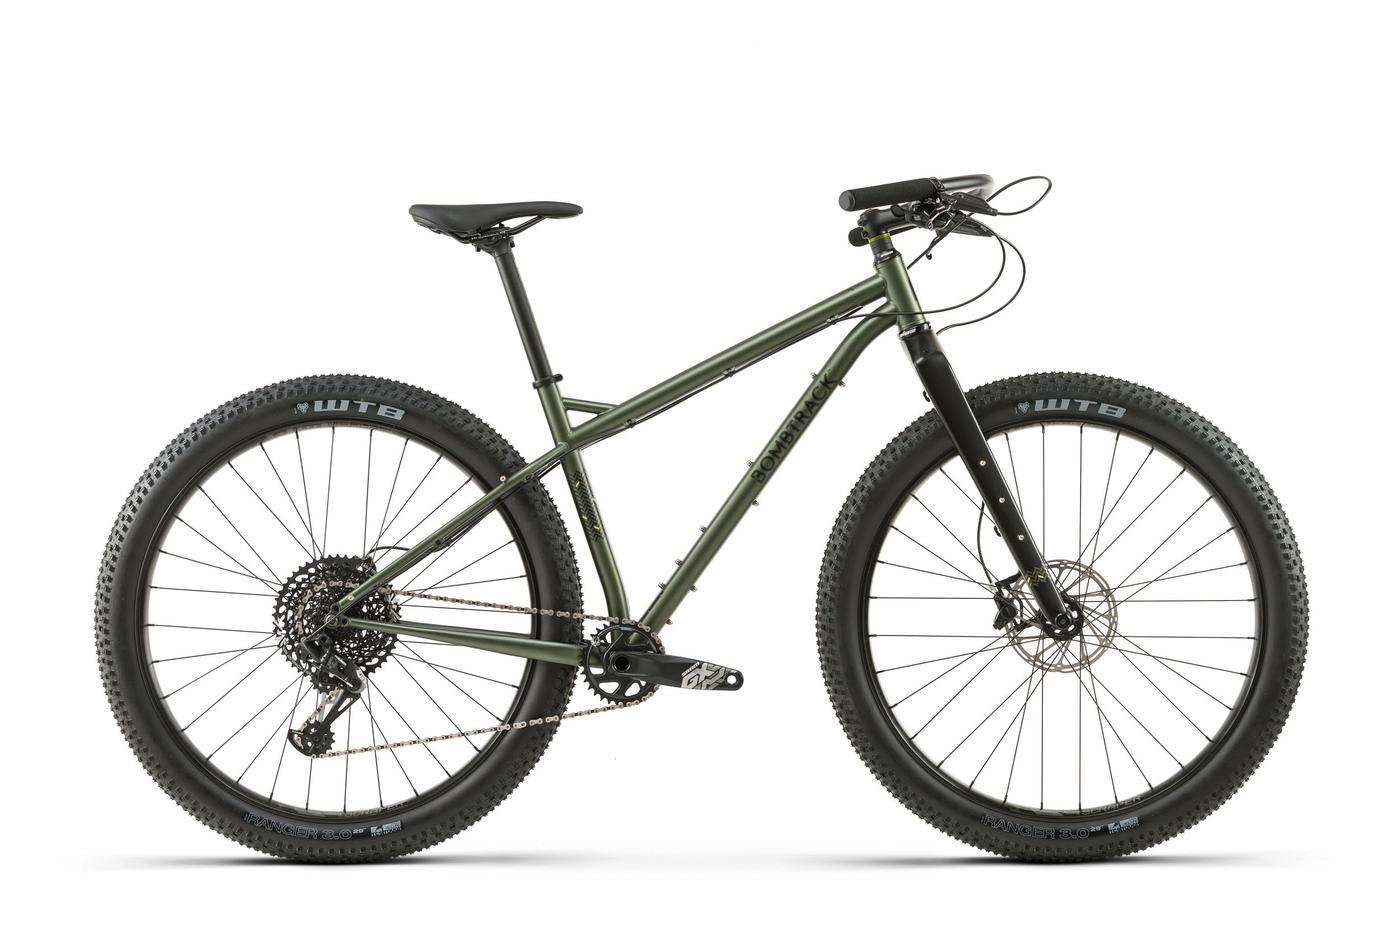 Bombtrack's BEYOND+ ADV 29+ Rigid Bikepacking Rig